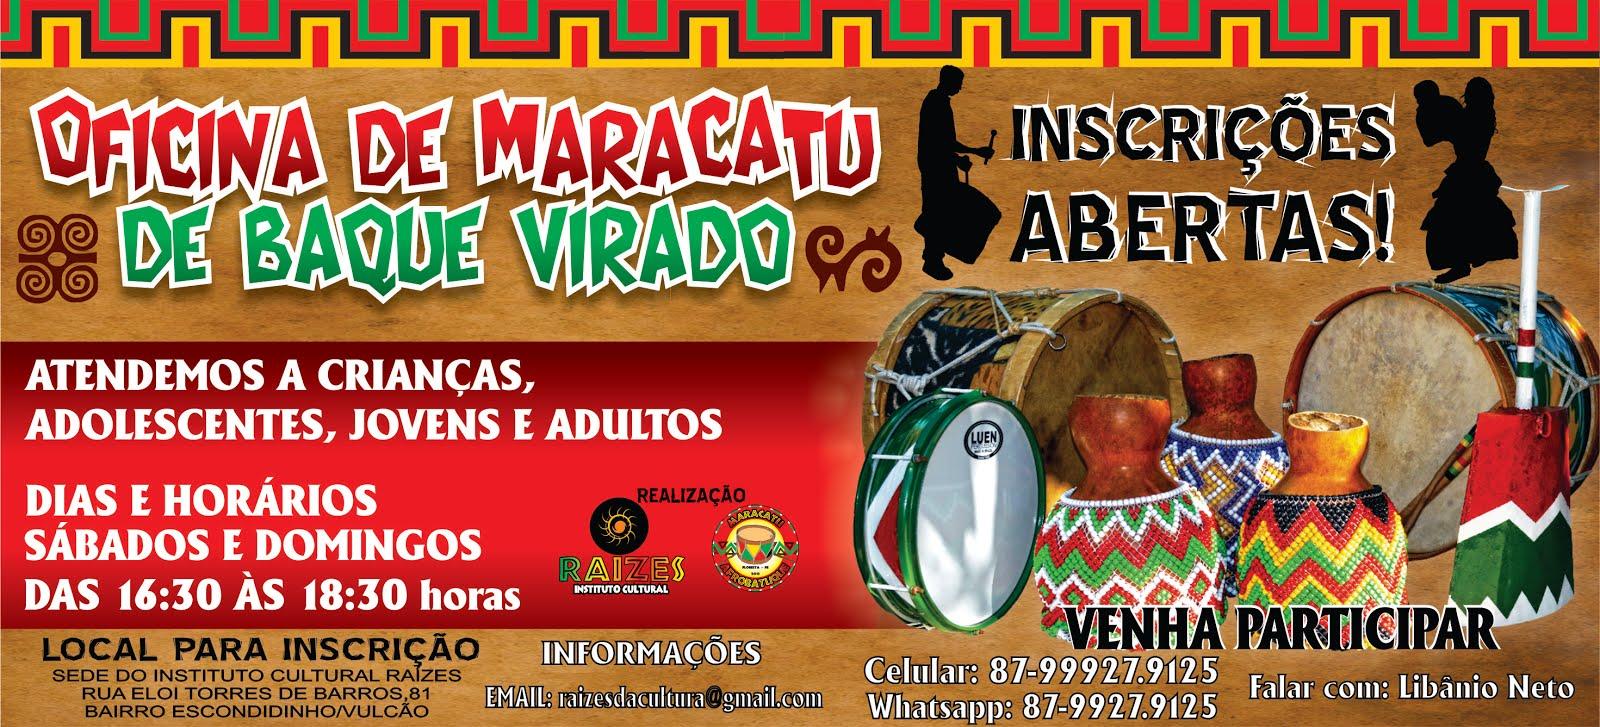 OFICINAS DE MARACATU DE BAQUE VIRADO